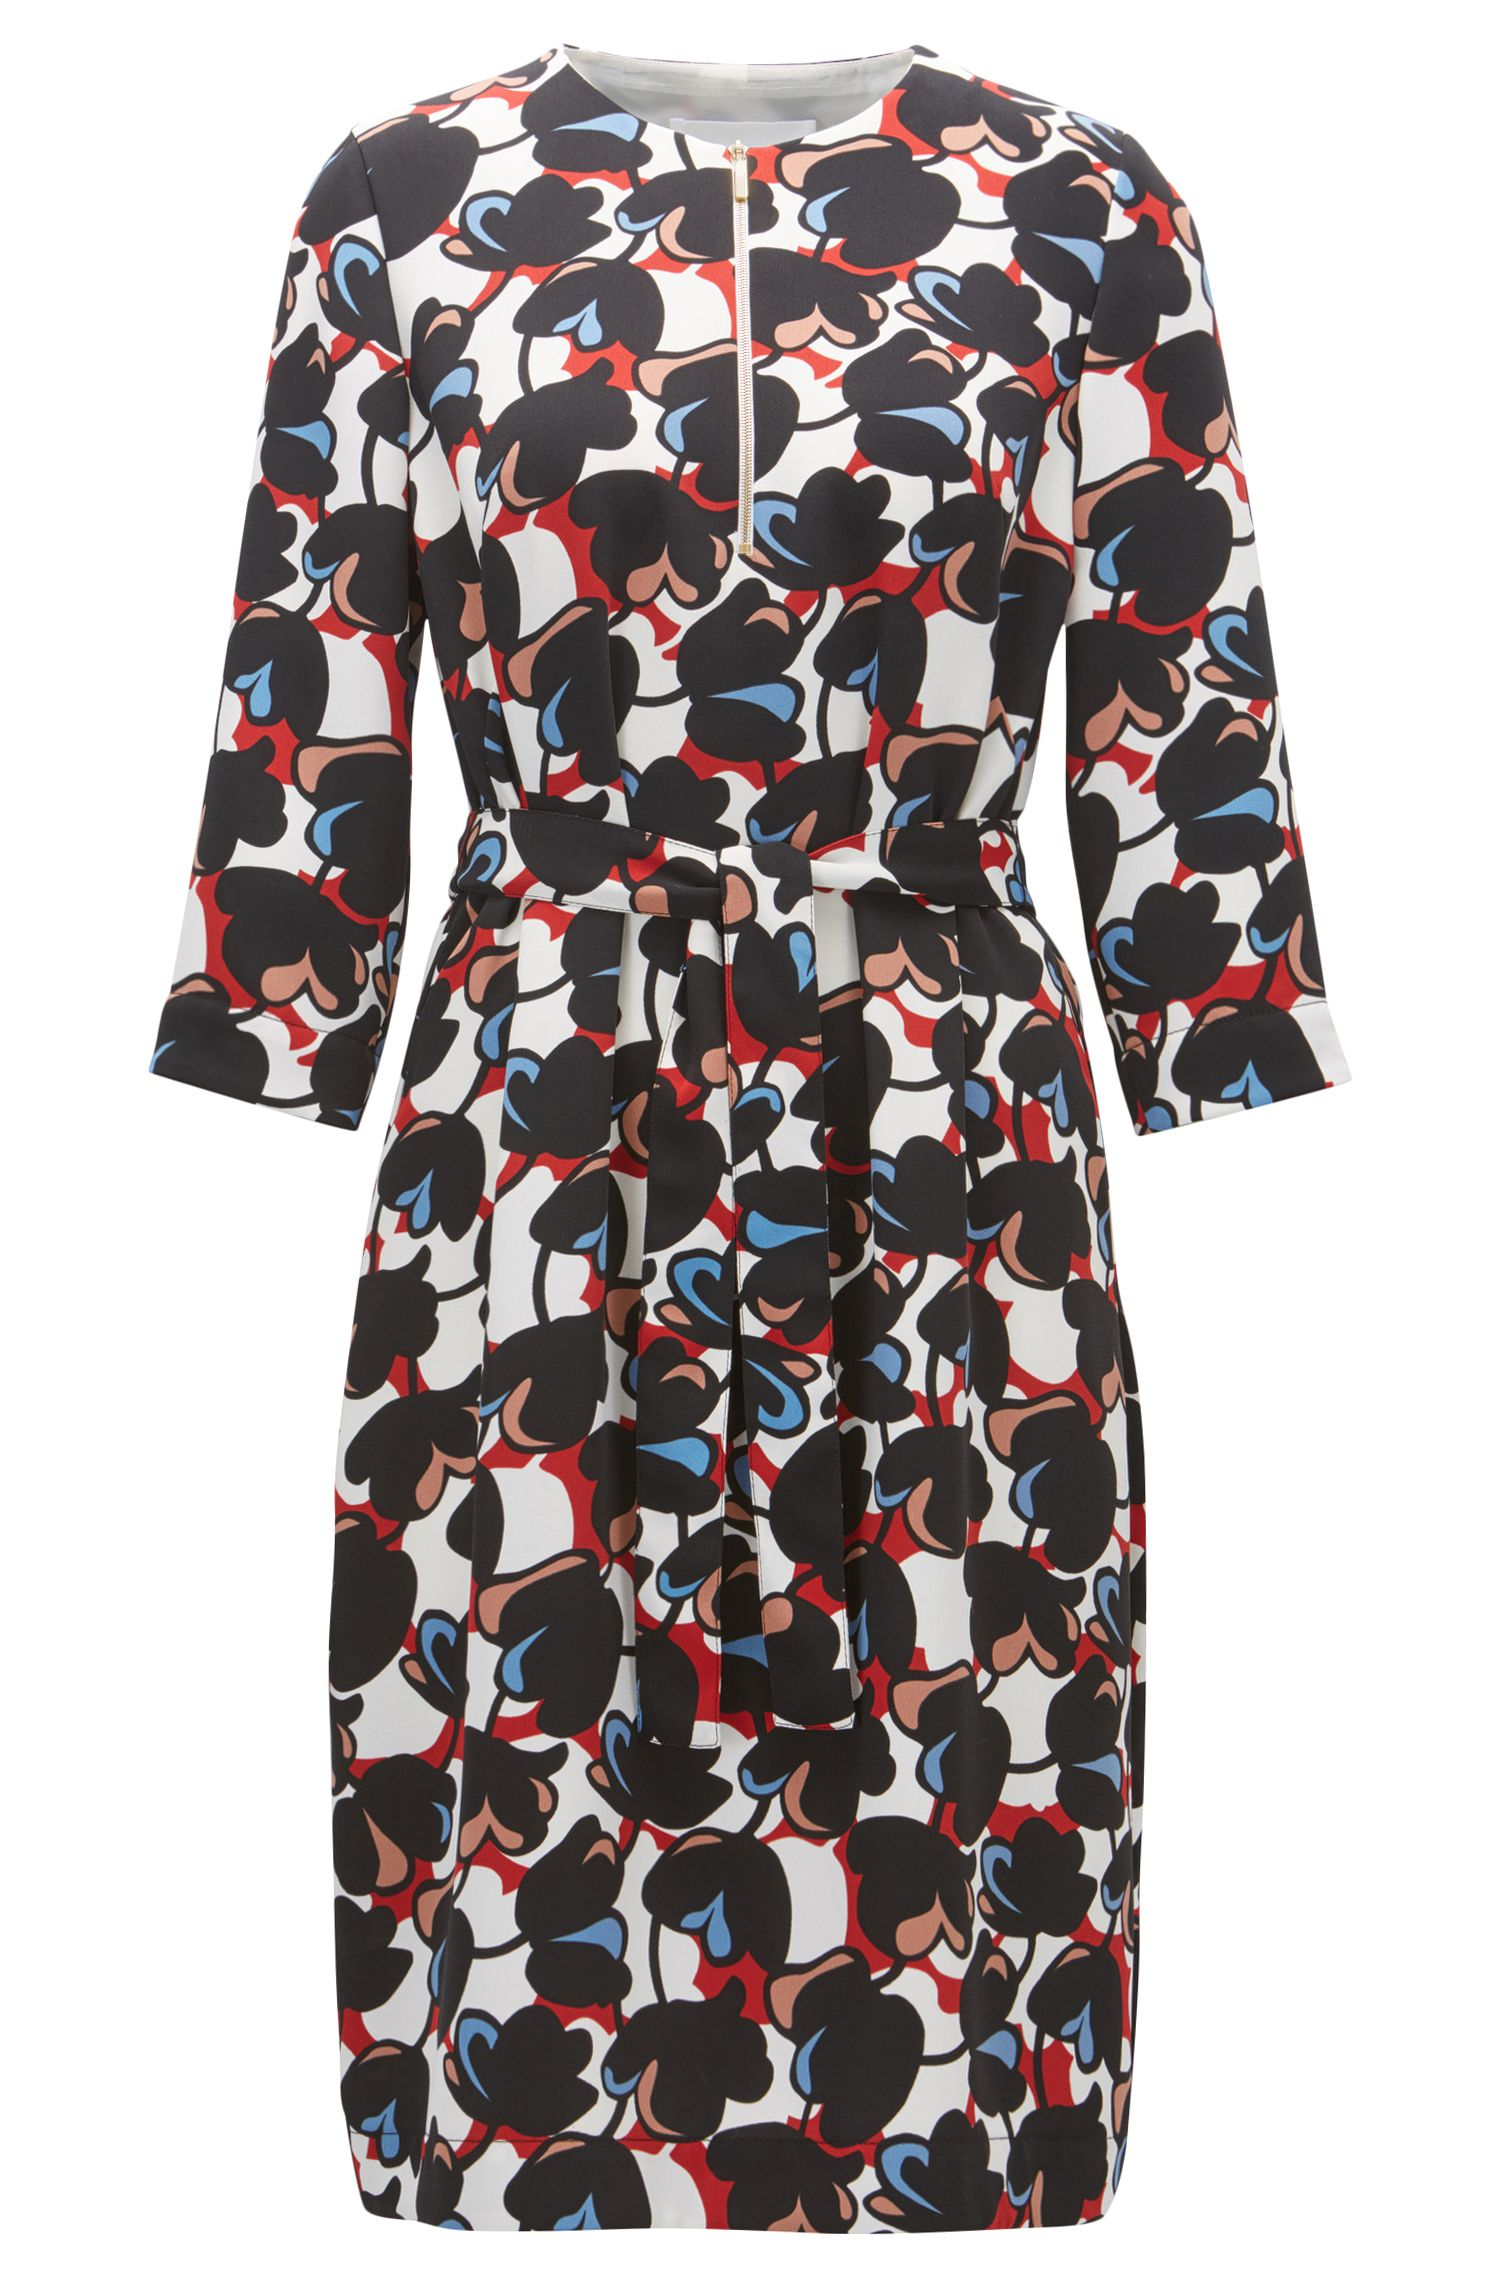 Floral-Print Dress | Dilamy